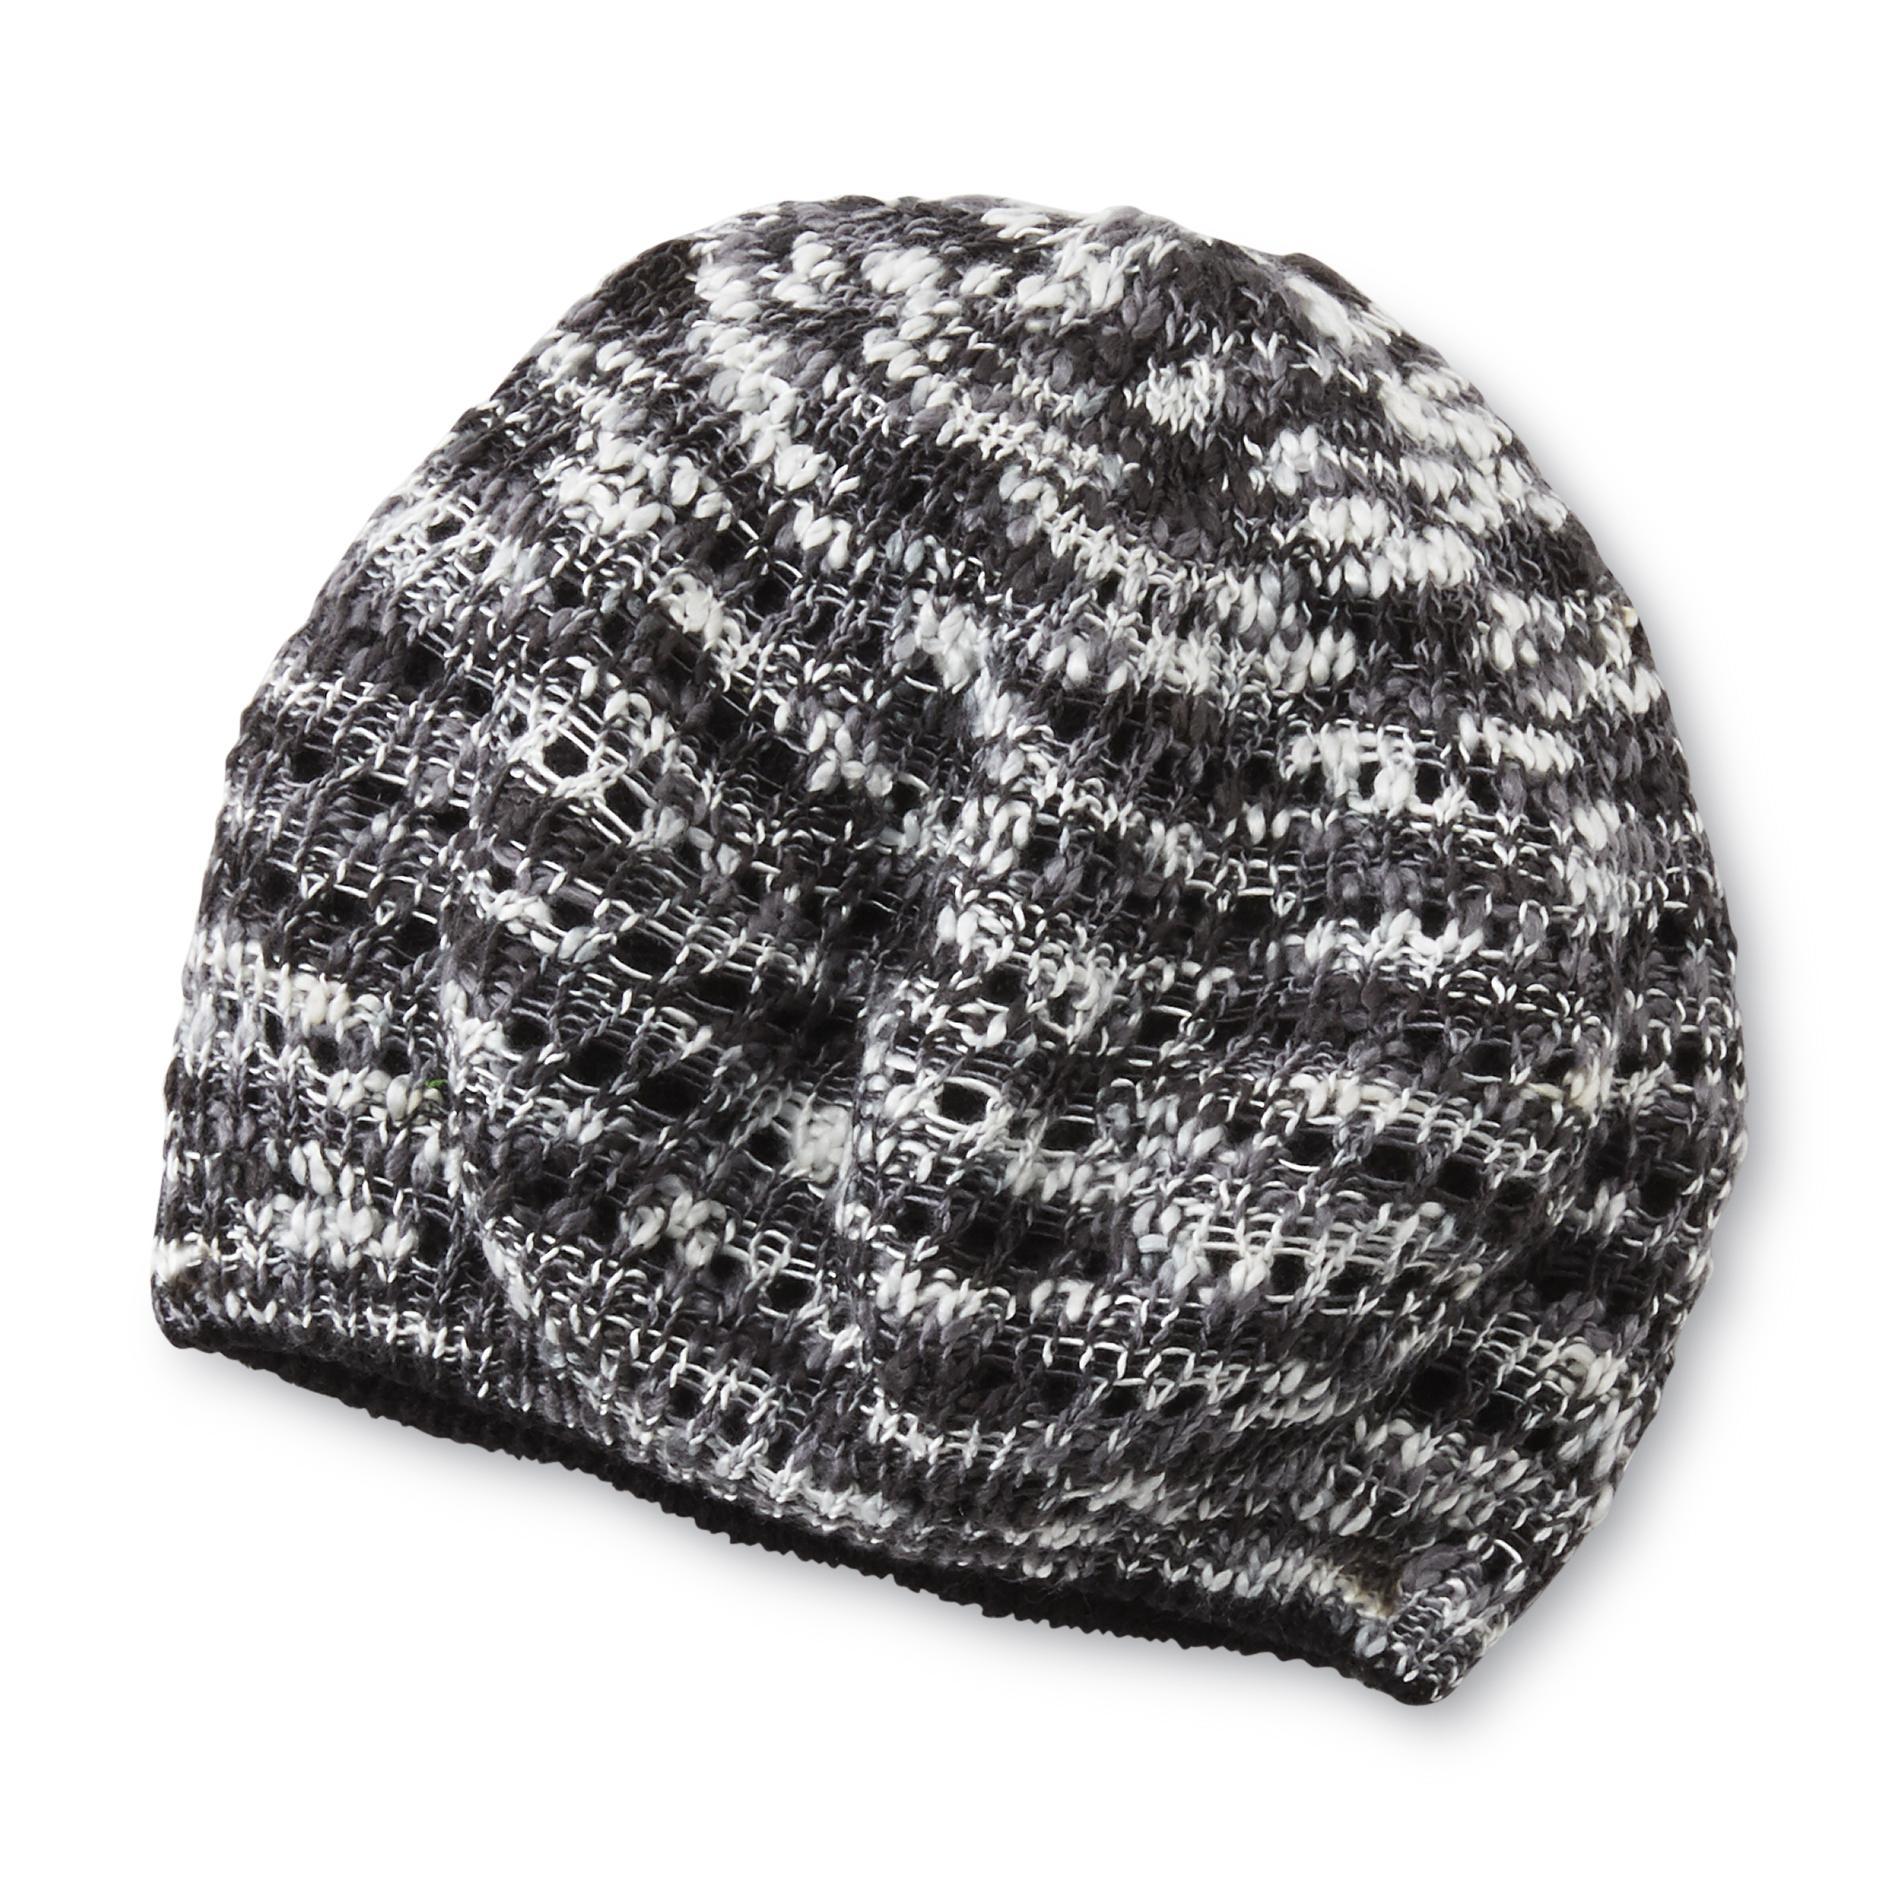 Joe Boxer Women's Reversible Crochet Beanie Hat - Space-Dye